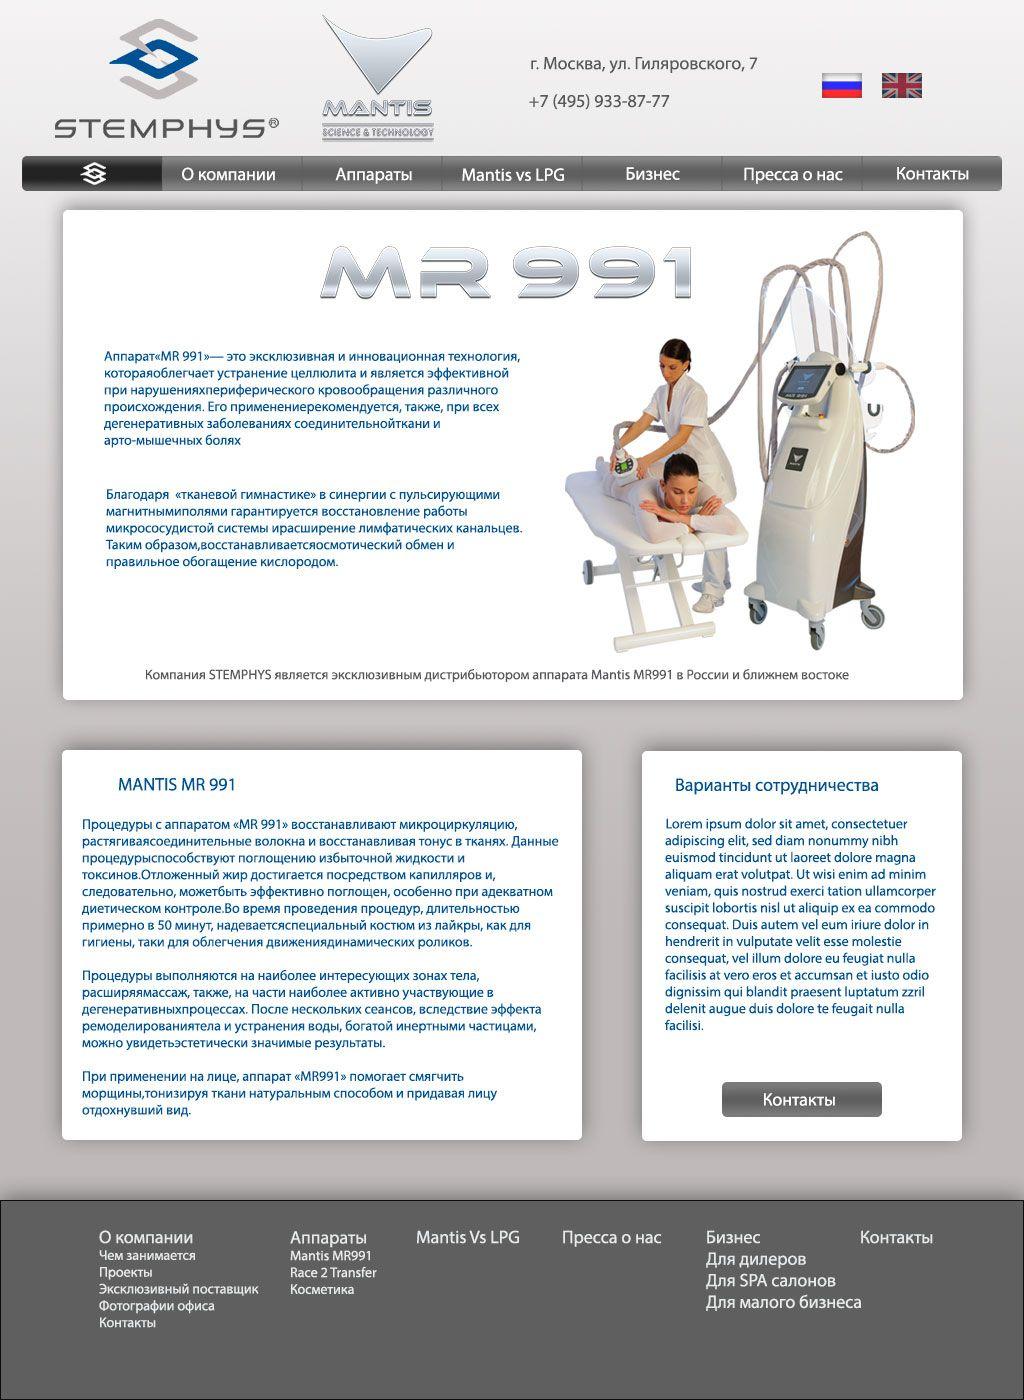 Создание рекламного сайта медицинского аппарата - дизайнер Canti